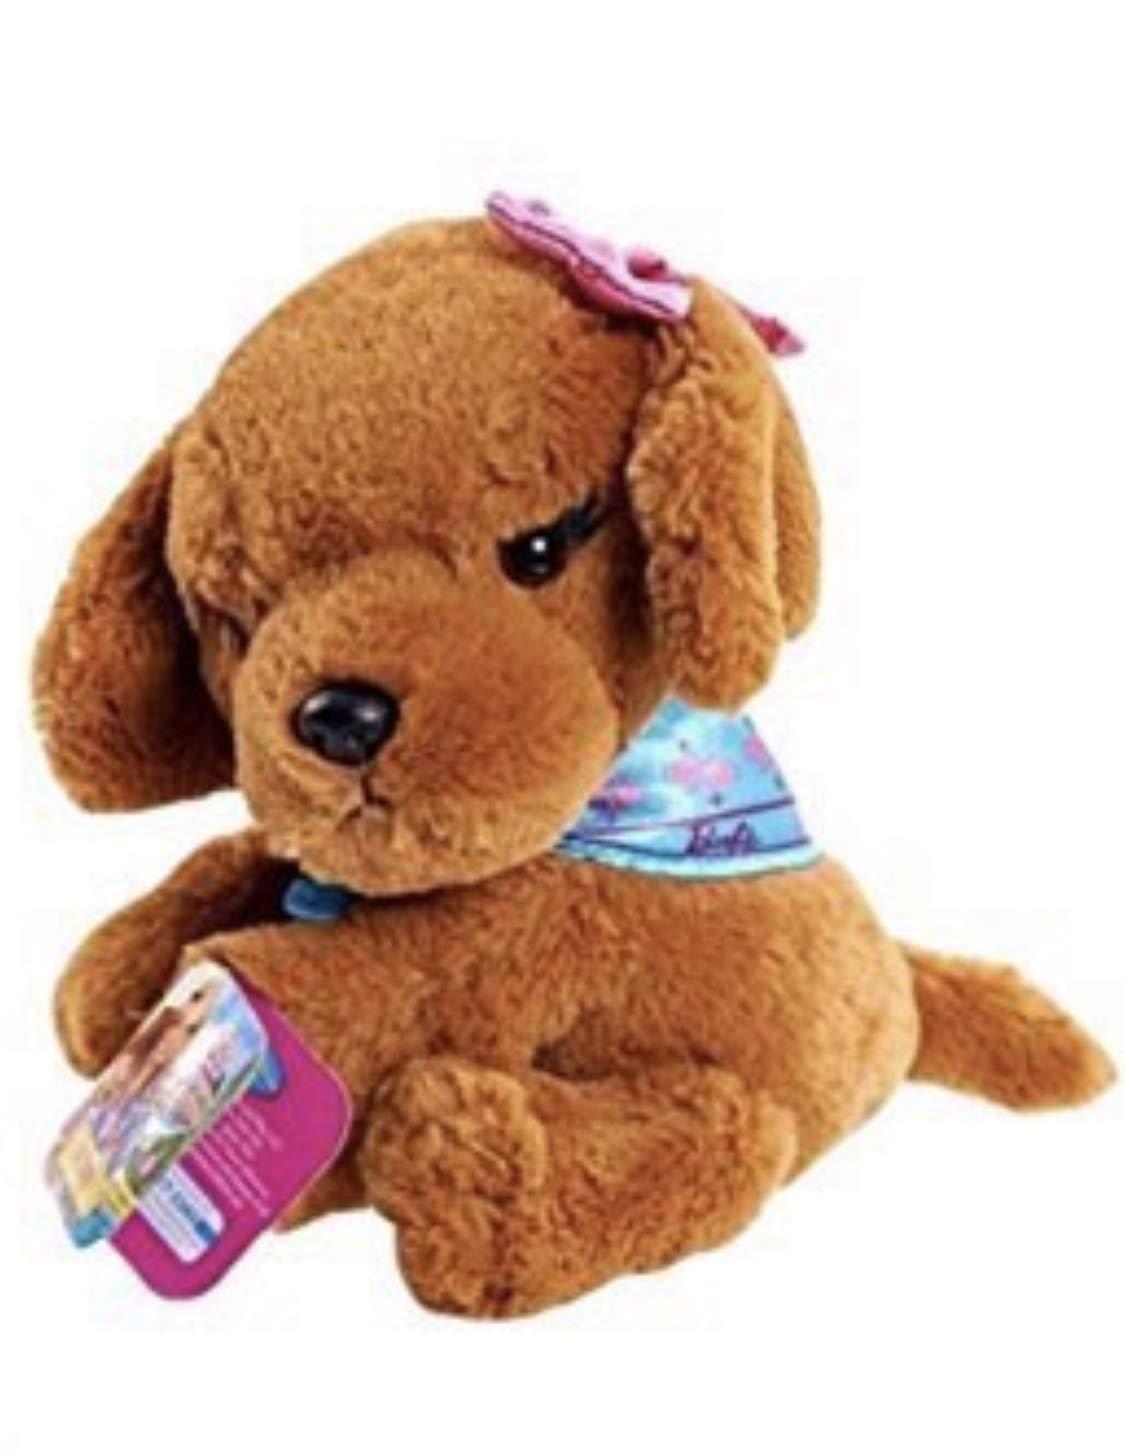 Barbie Puppy Adventure Plush - Marronee